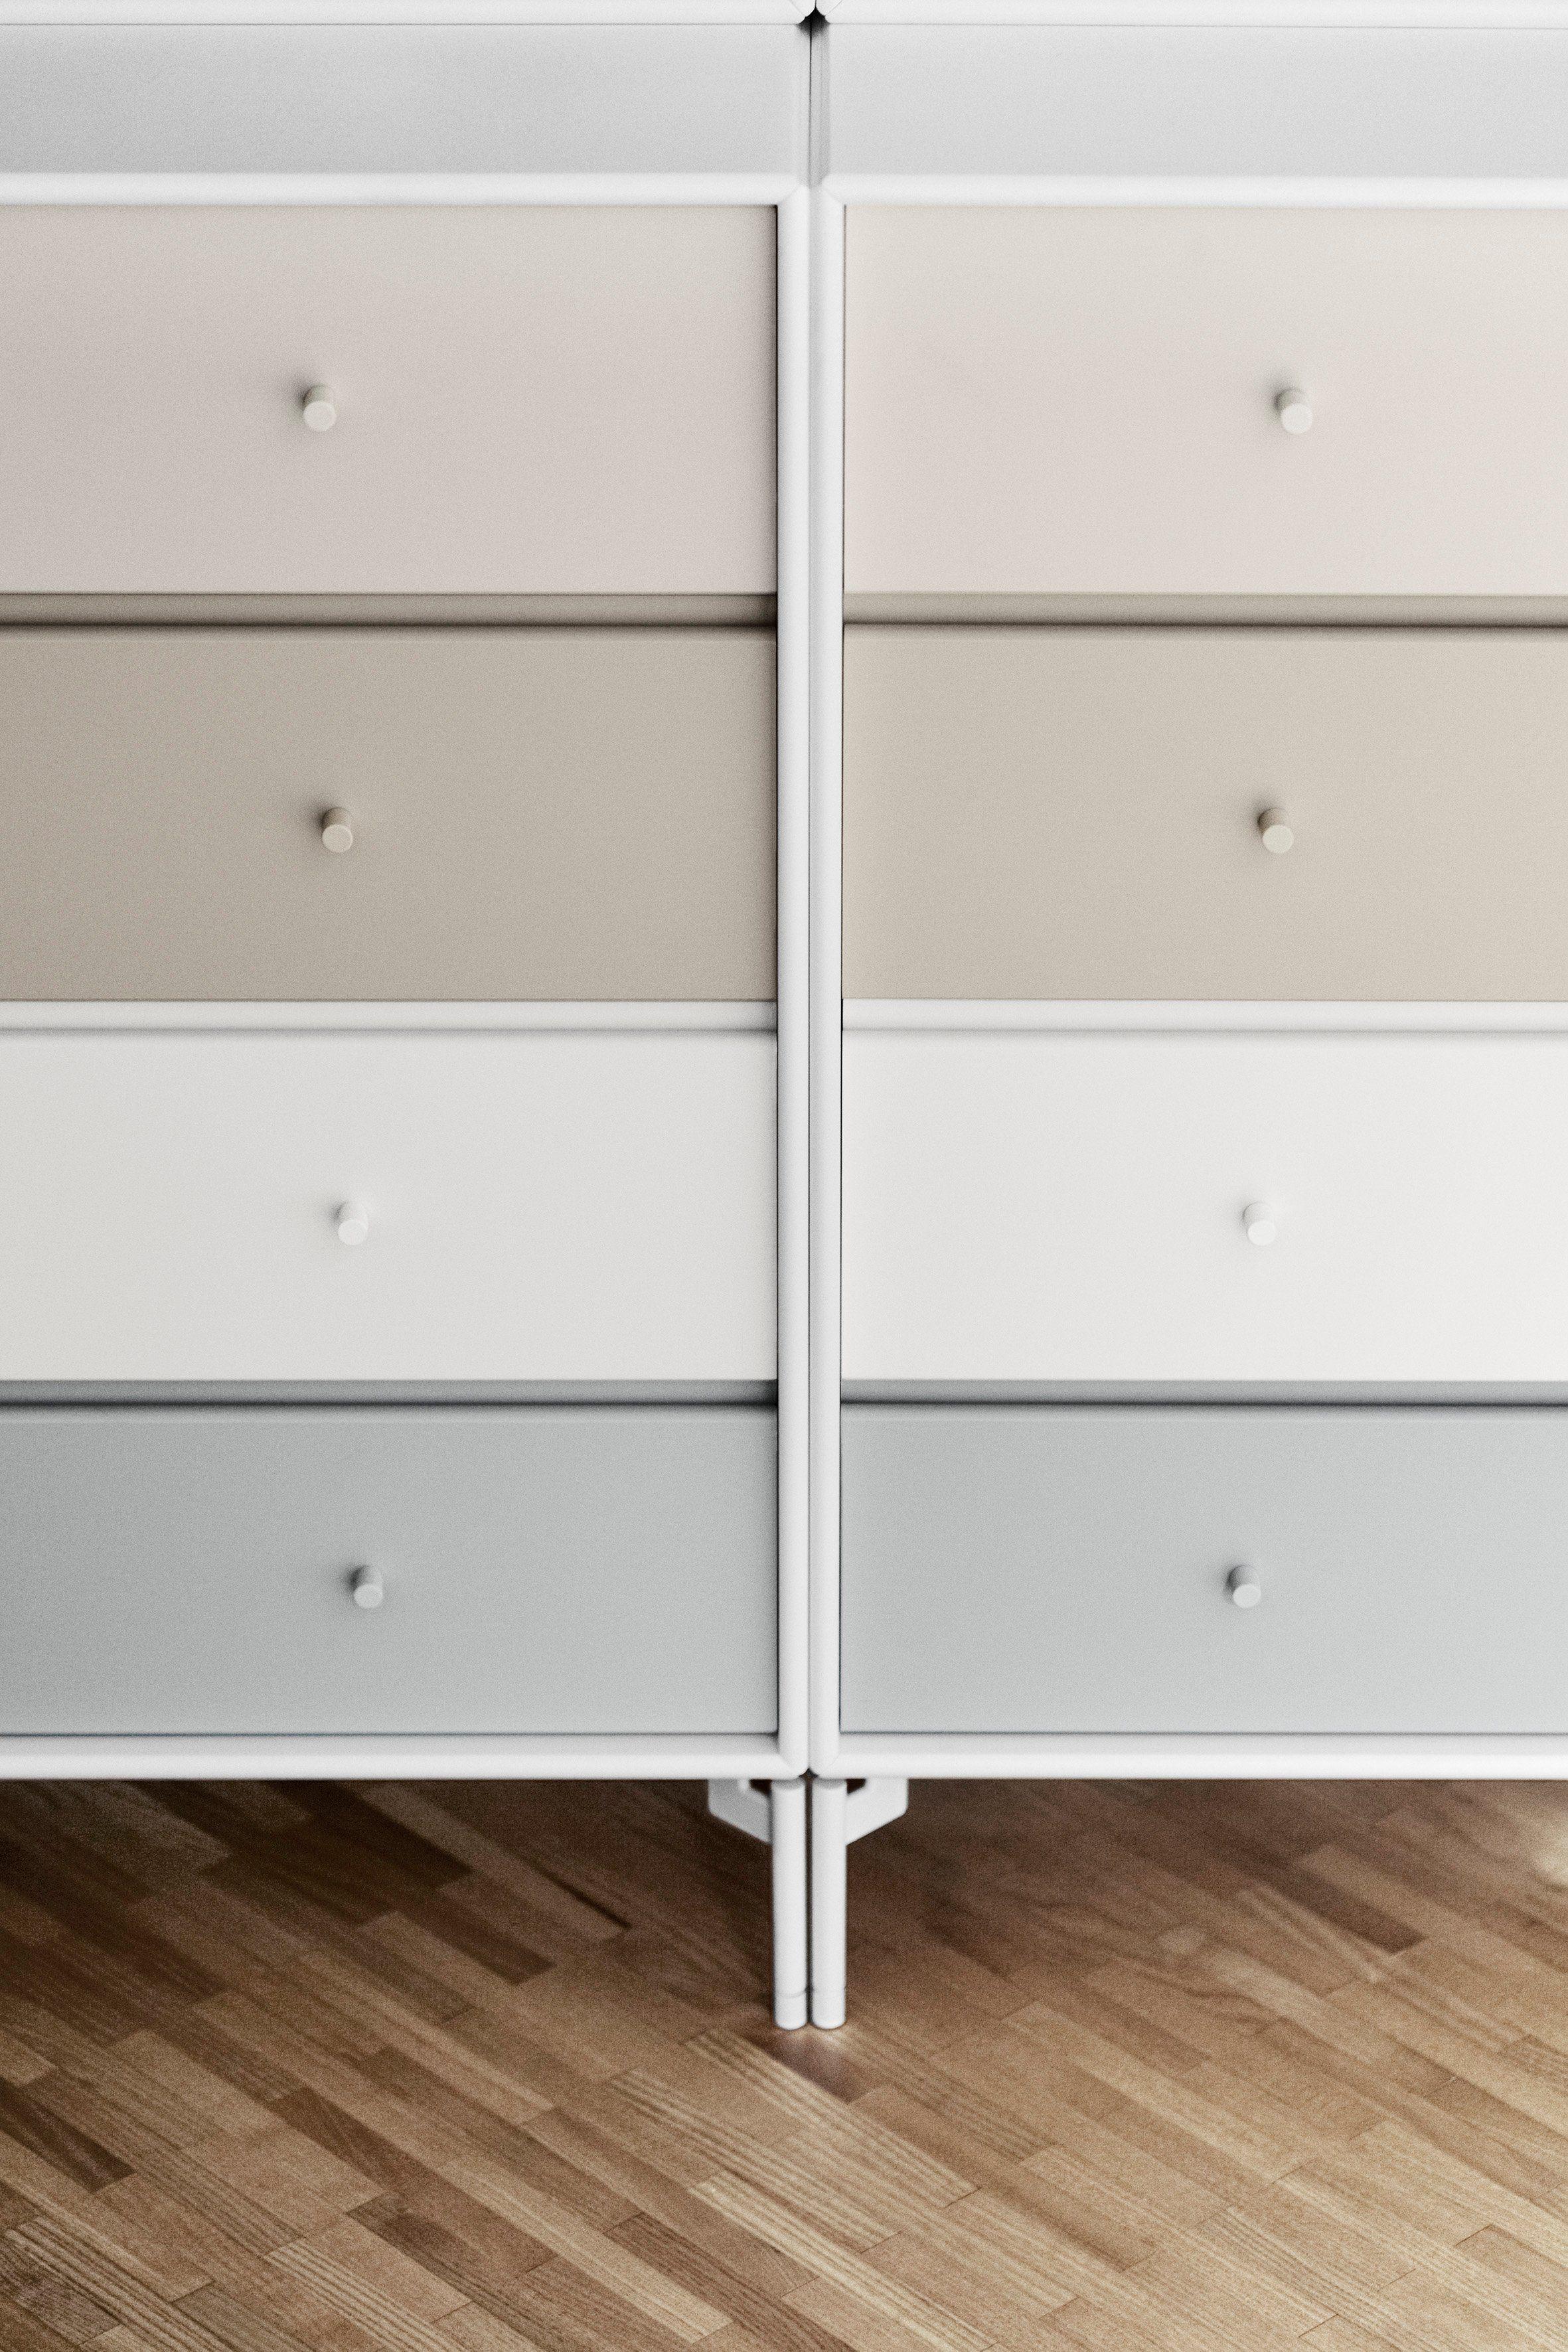 #montana #furniture #danish #design #storage #pastels